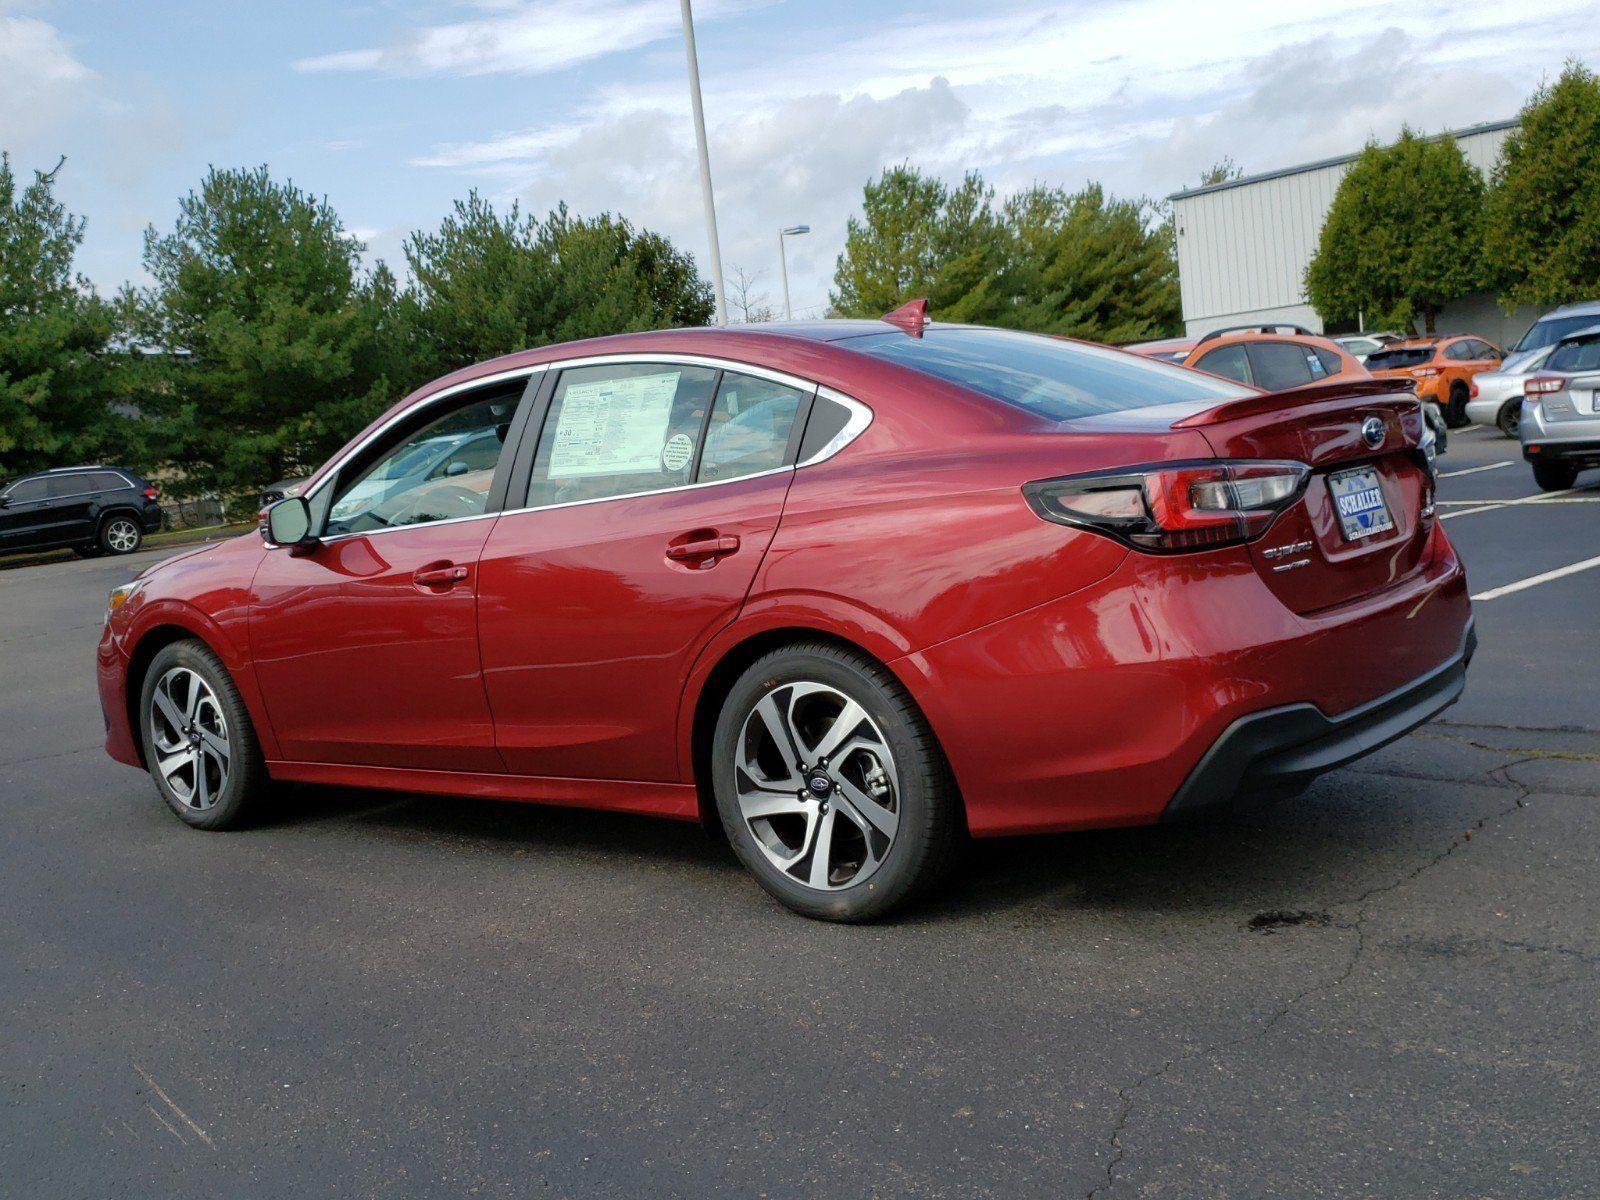 2020 Subaru Legacy Price And Release Date Subaru Legacy Subaru Subaru Outback For Sale